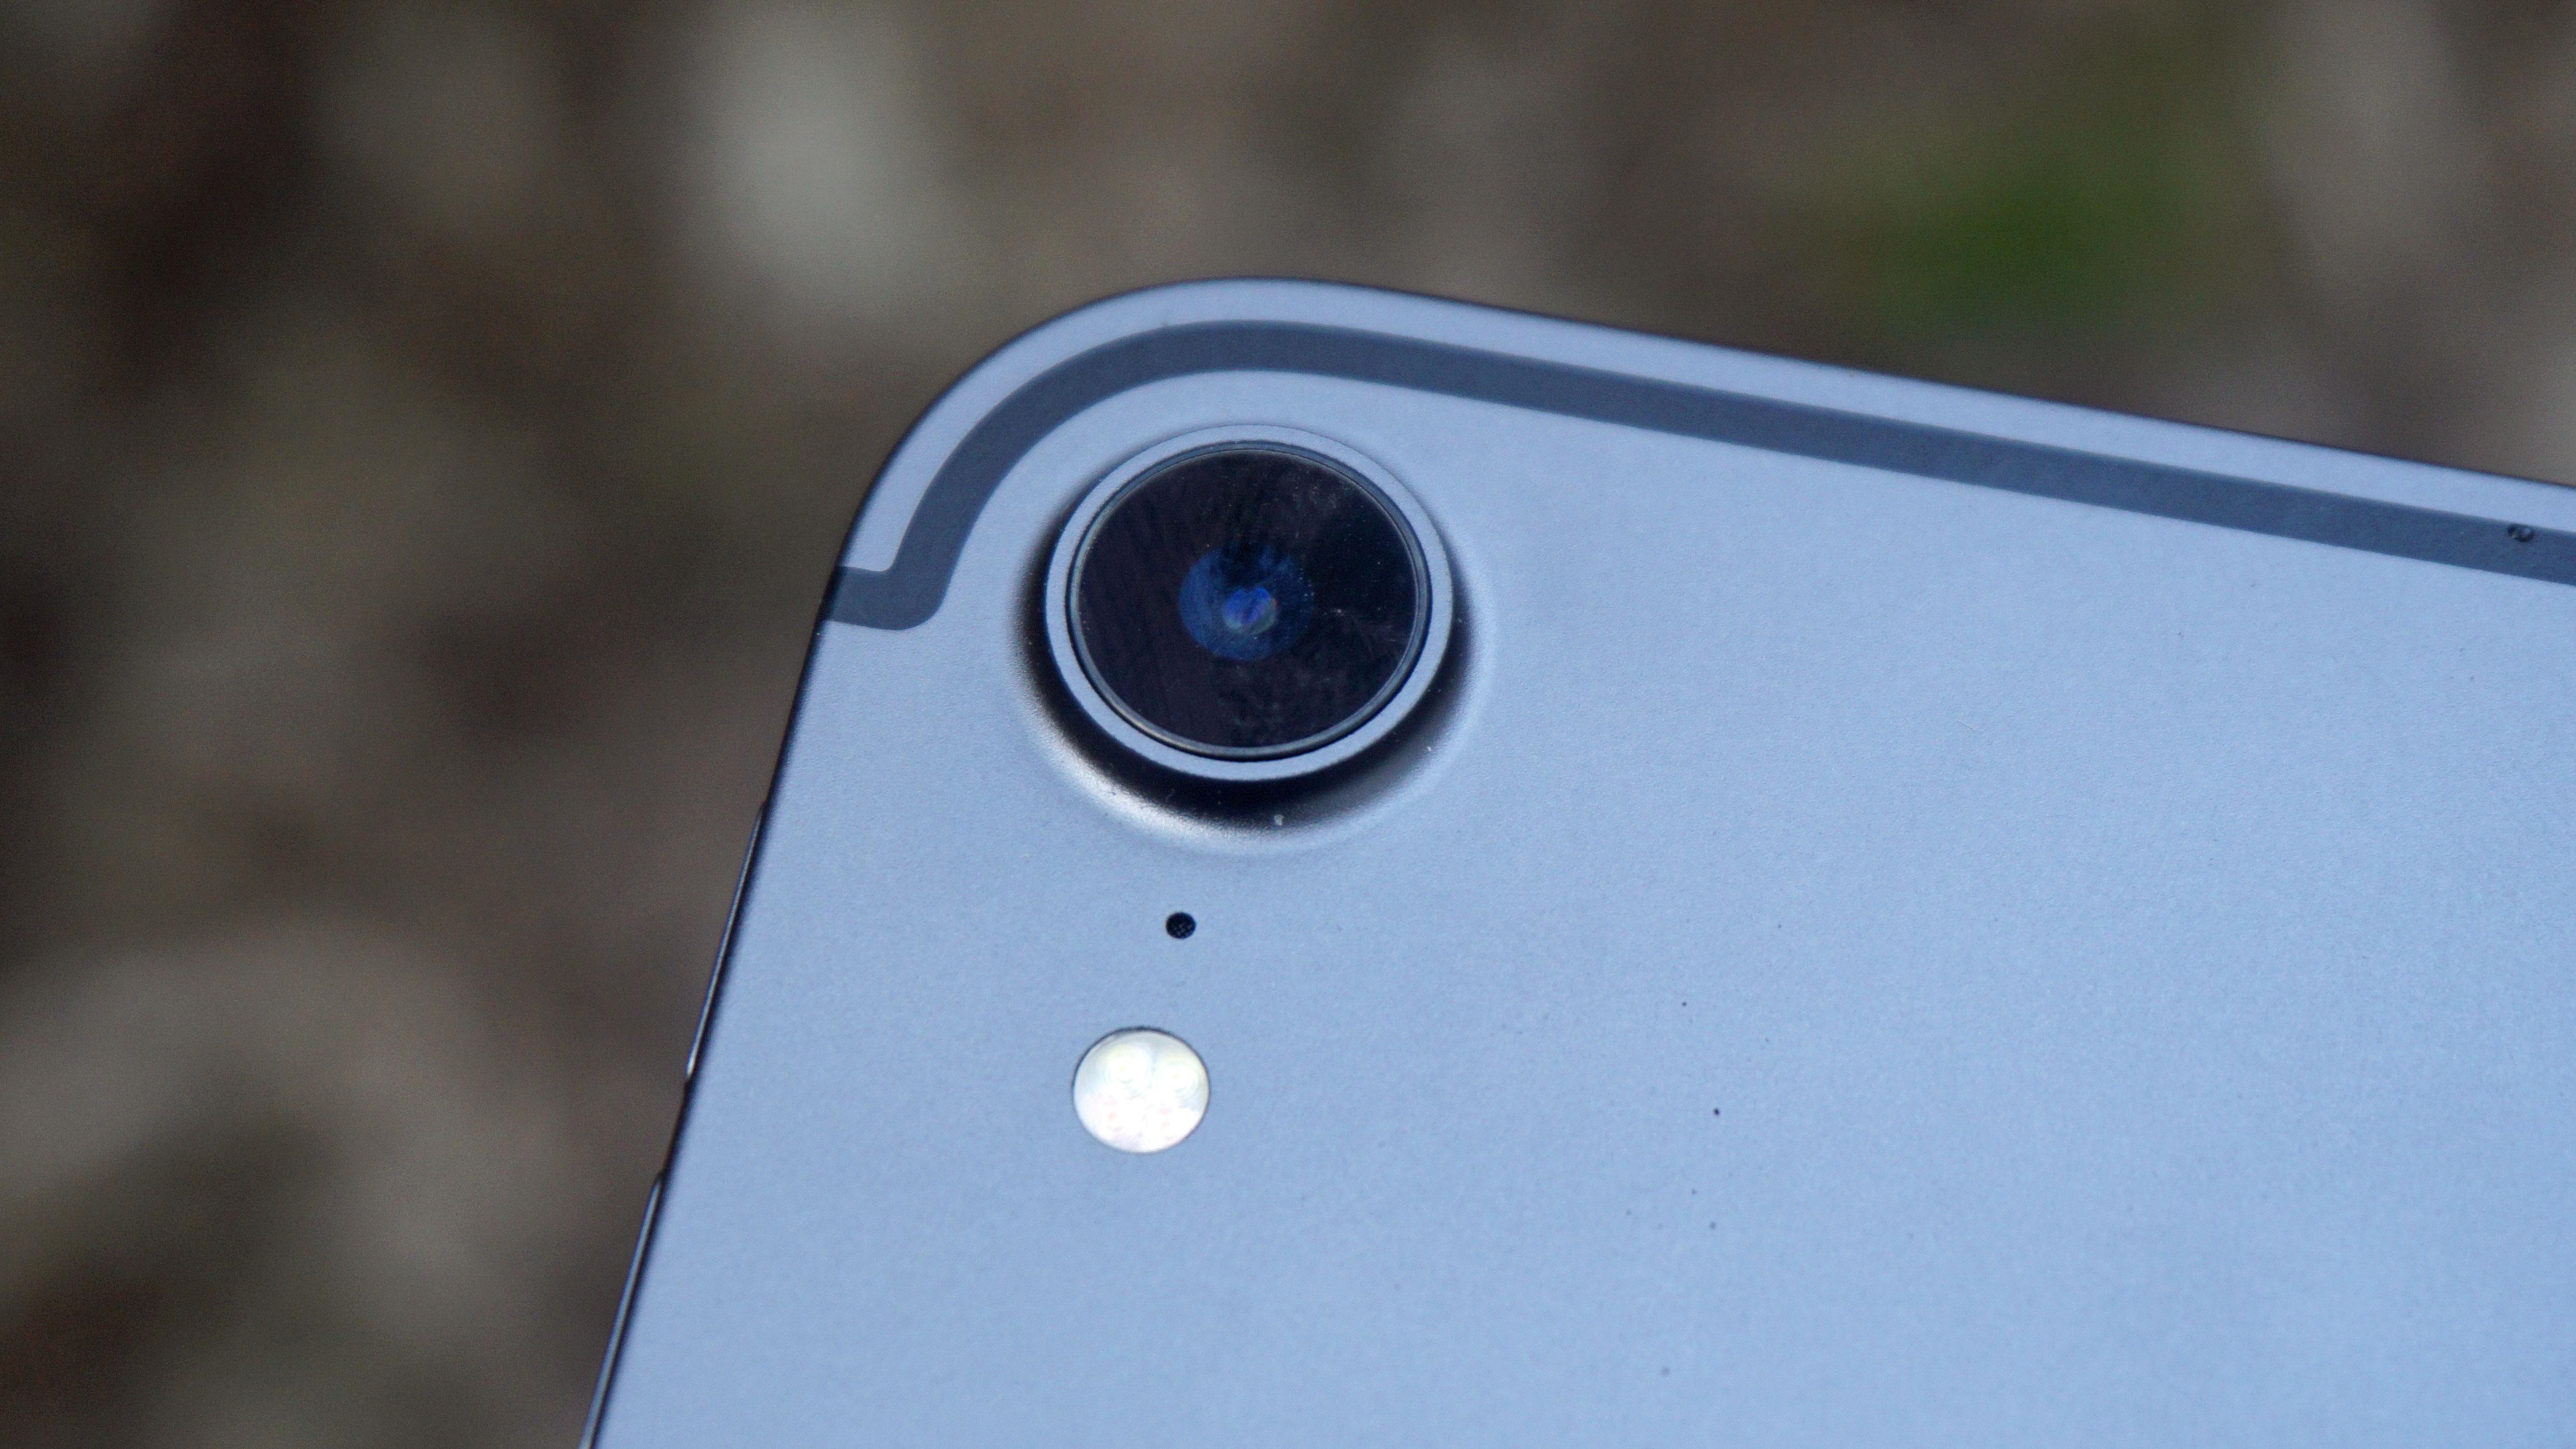 The rear camera. Image credit: TechRadar